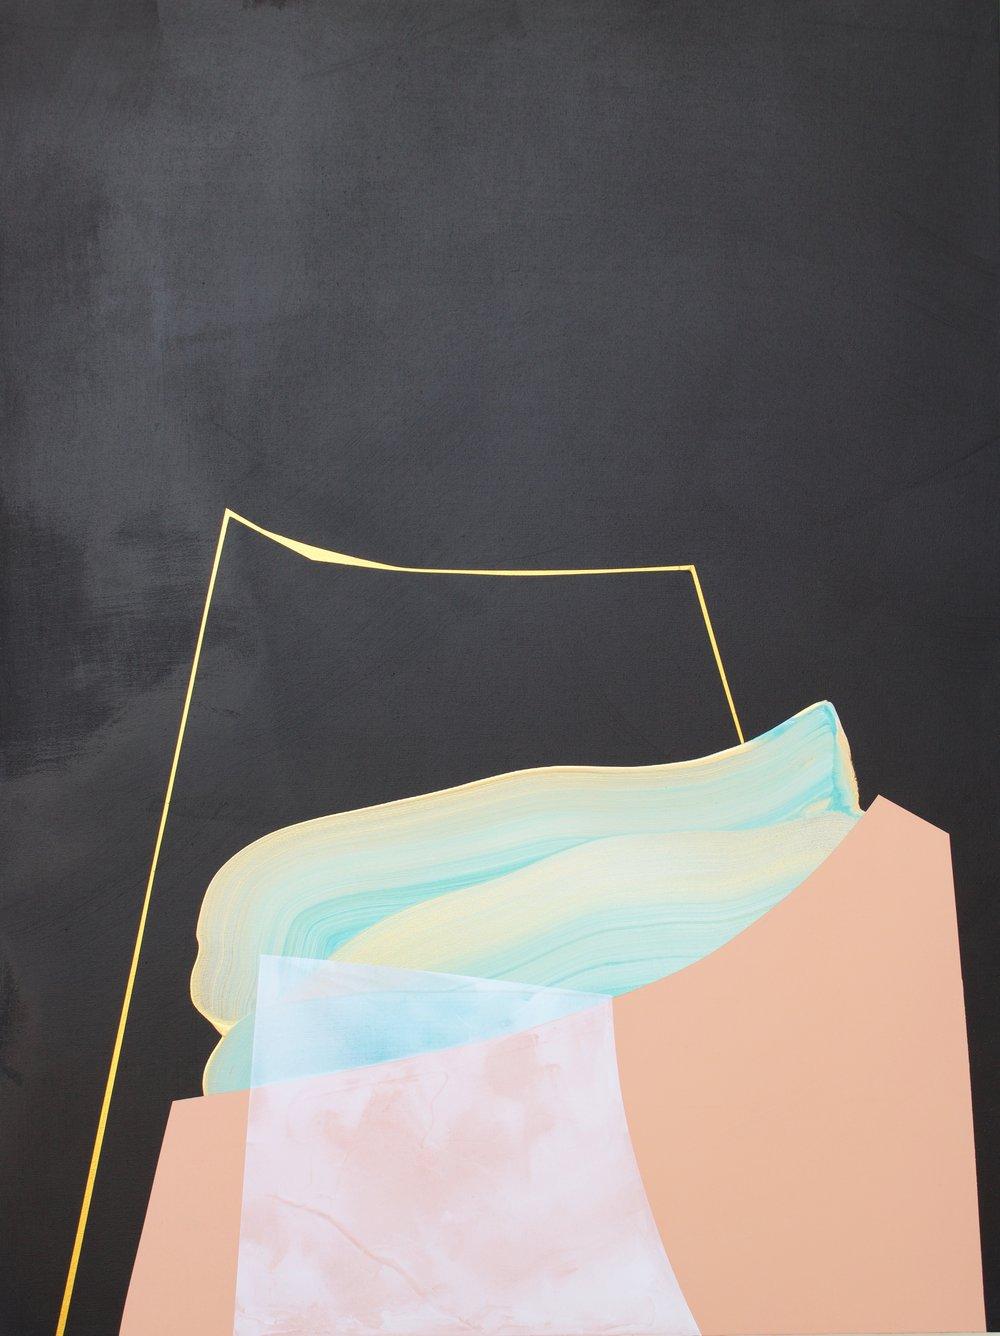 Onwards and Upwards  Mixed acrylic medium on canvas 40x30 inches $1100.00